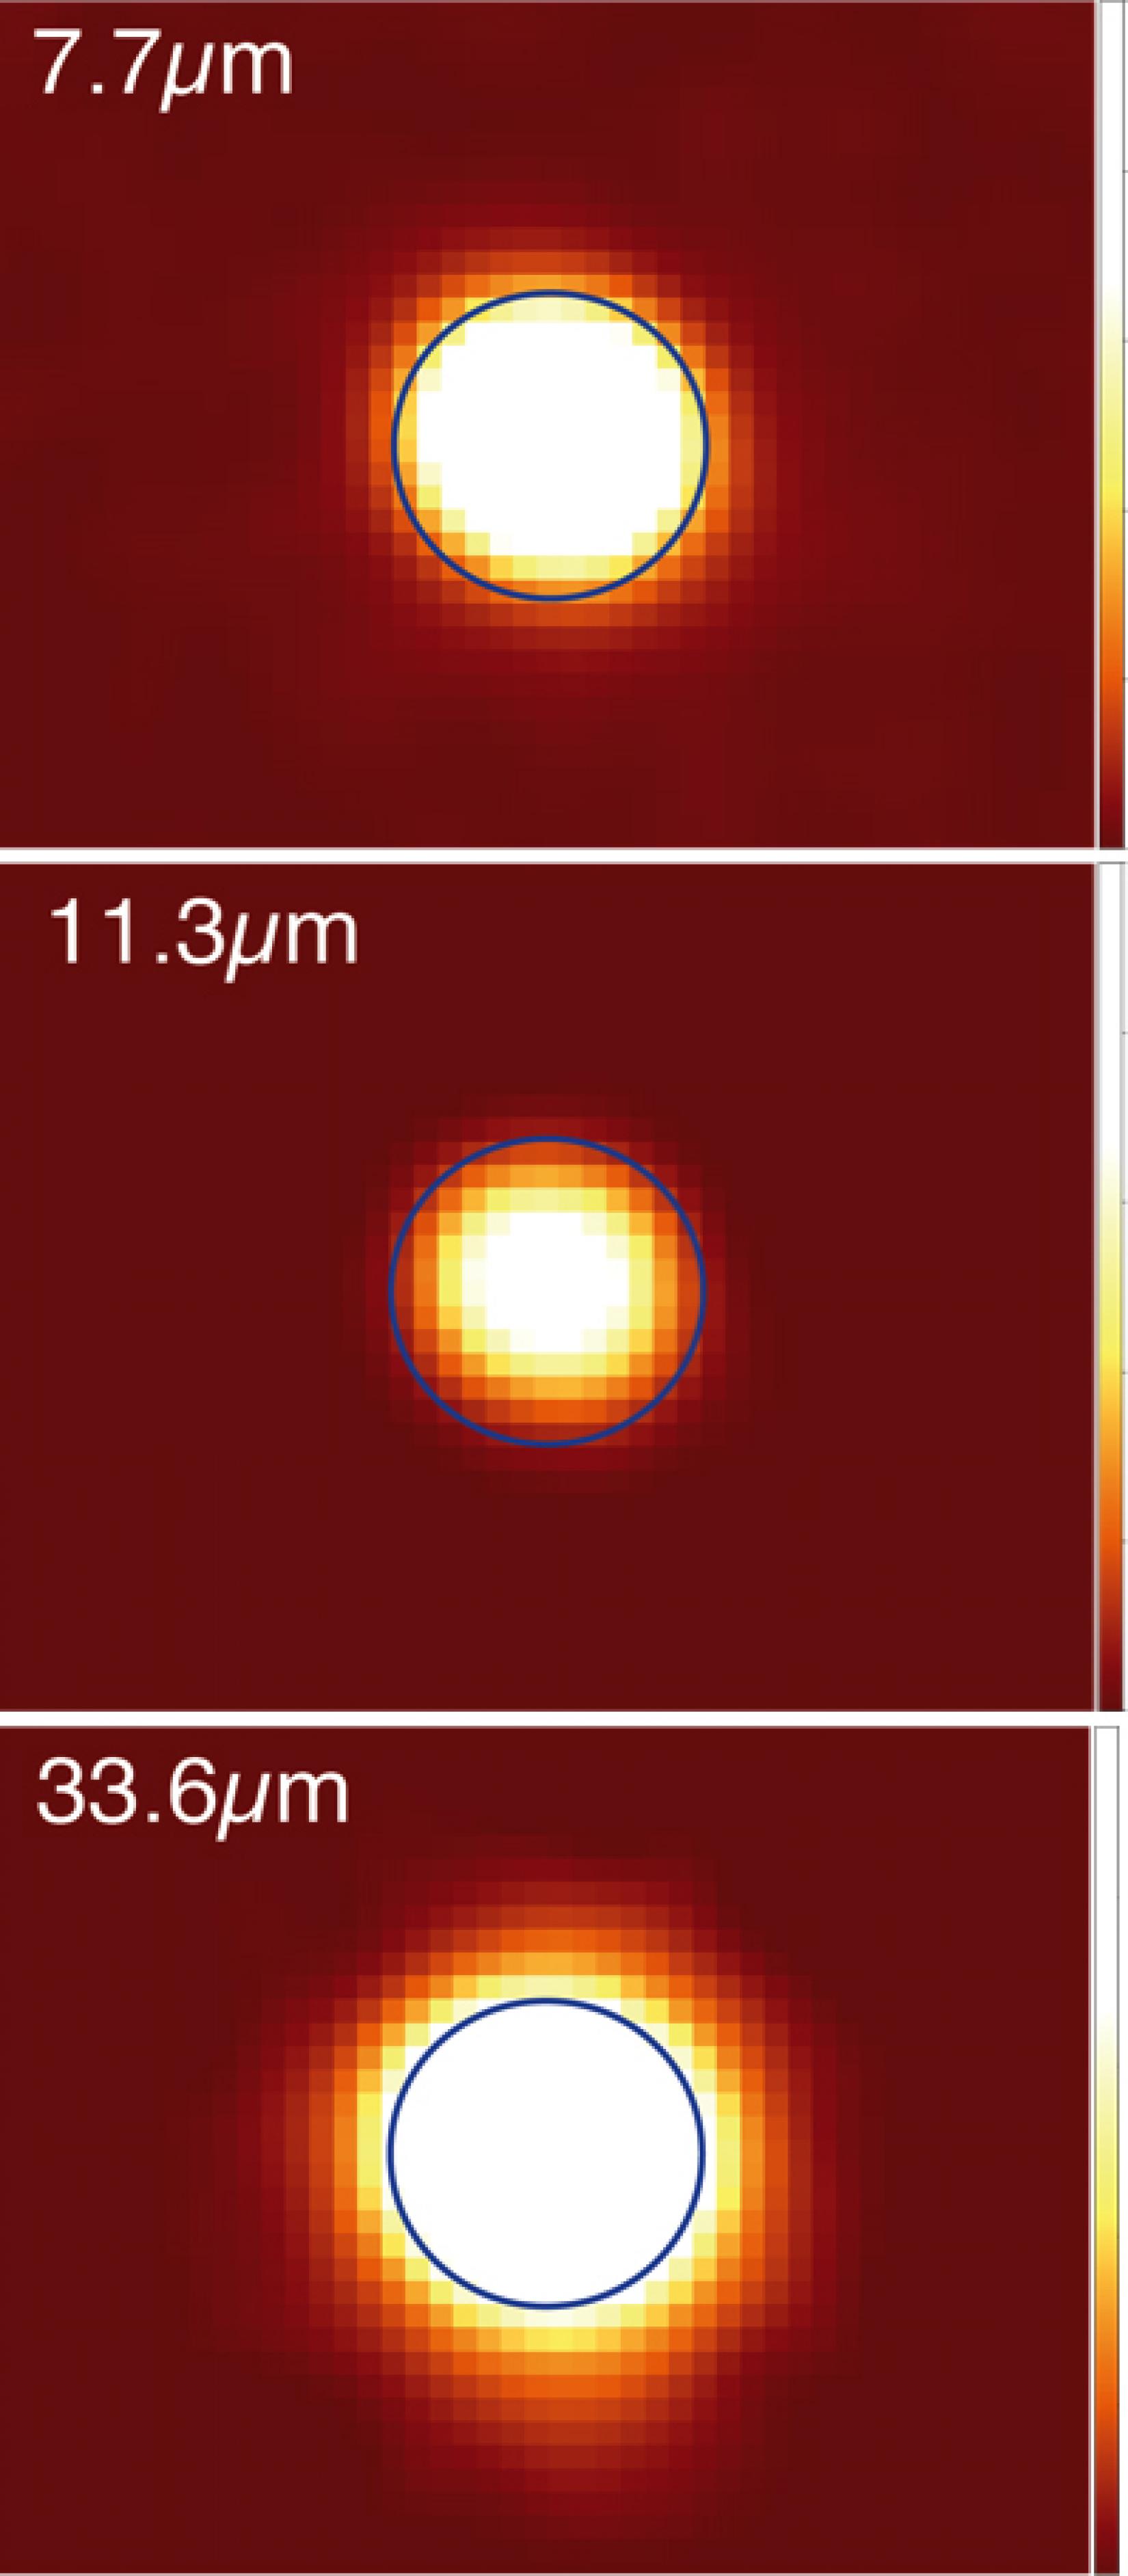 SOFIA/FORCAST images of the planetary nebula BD+30 3639